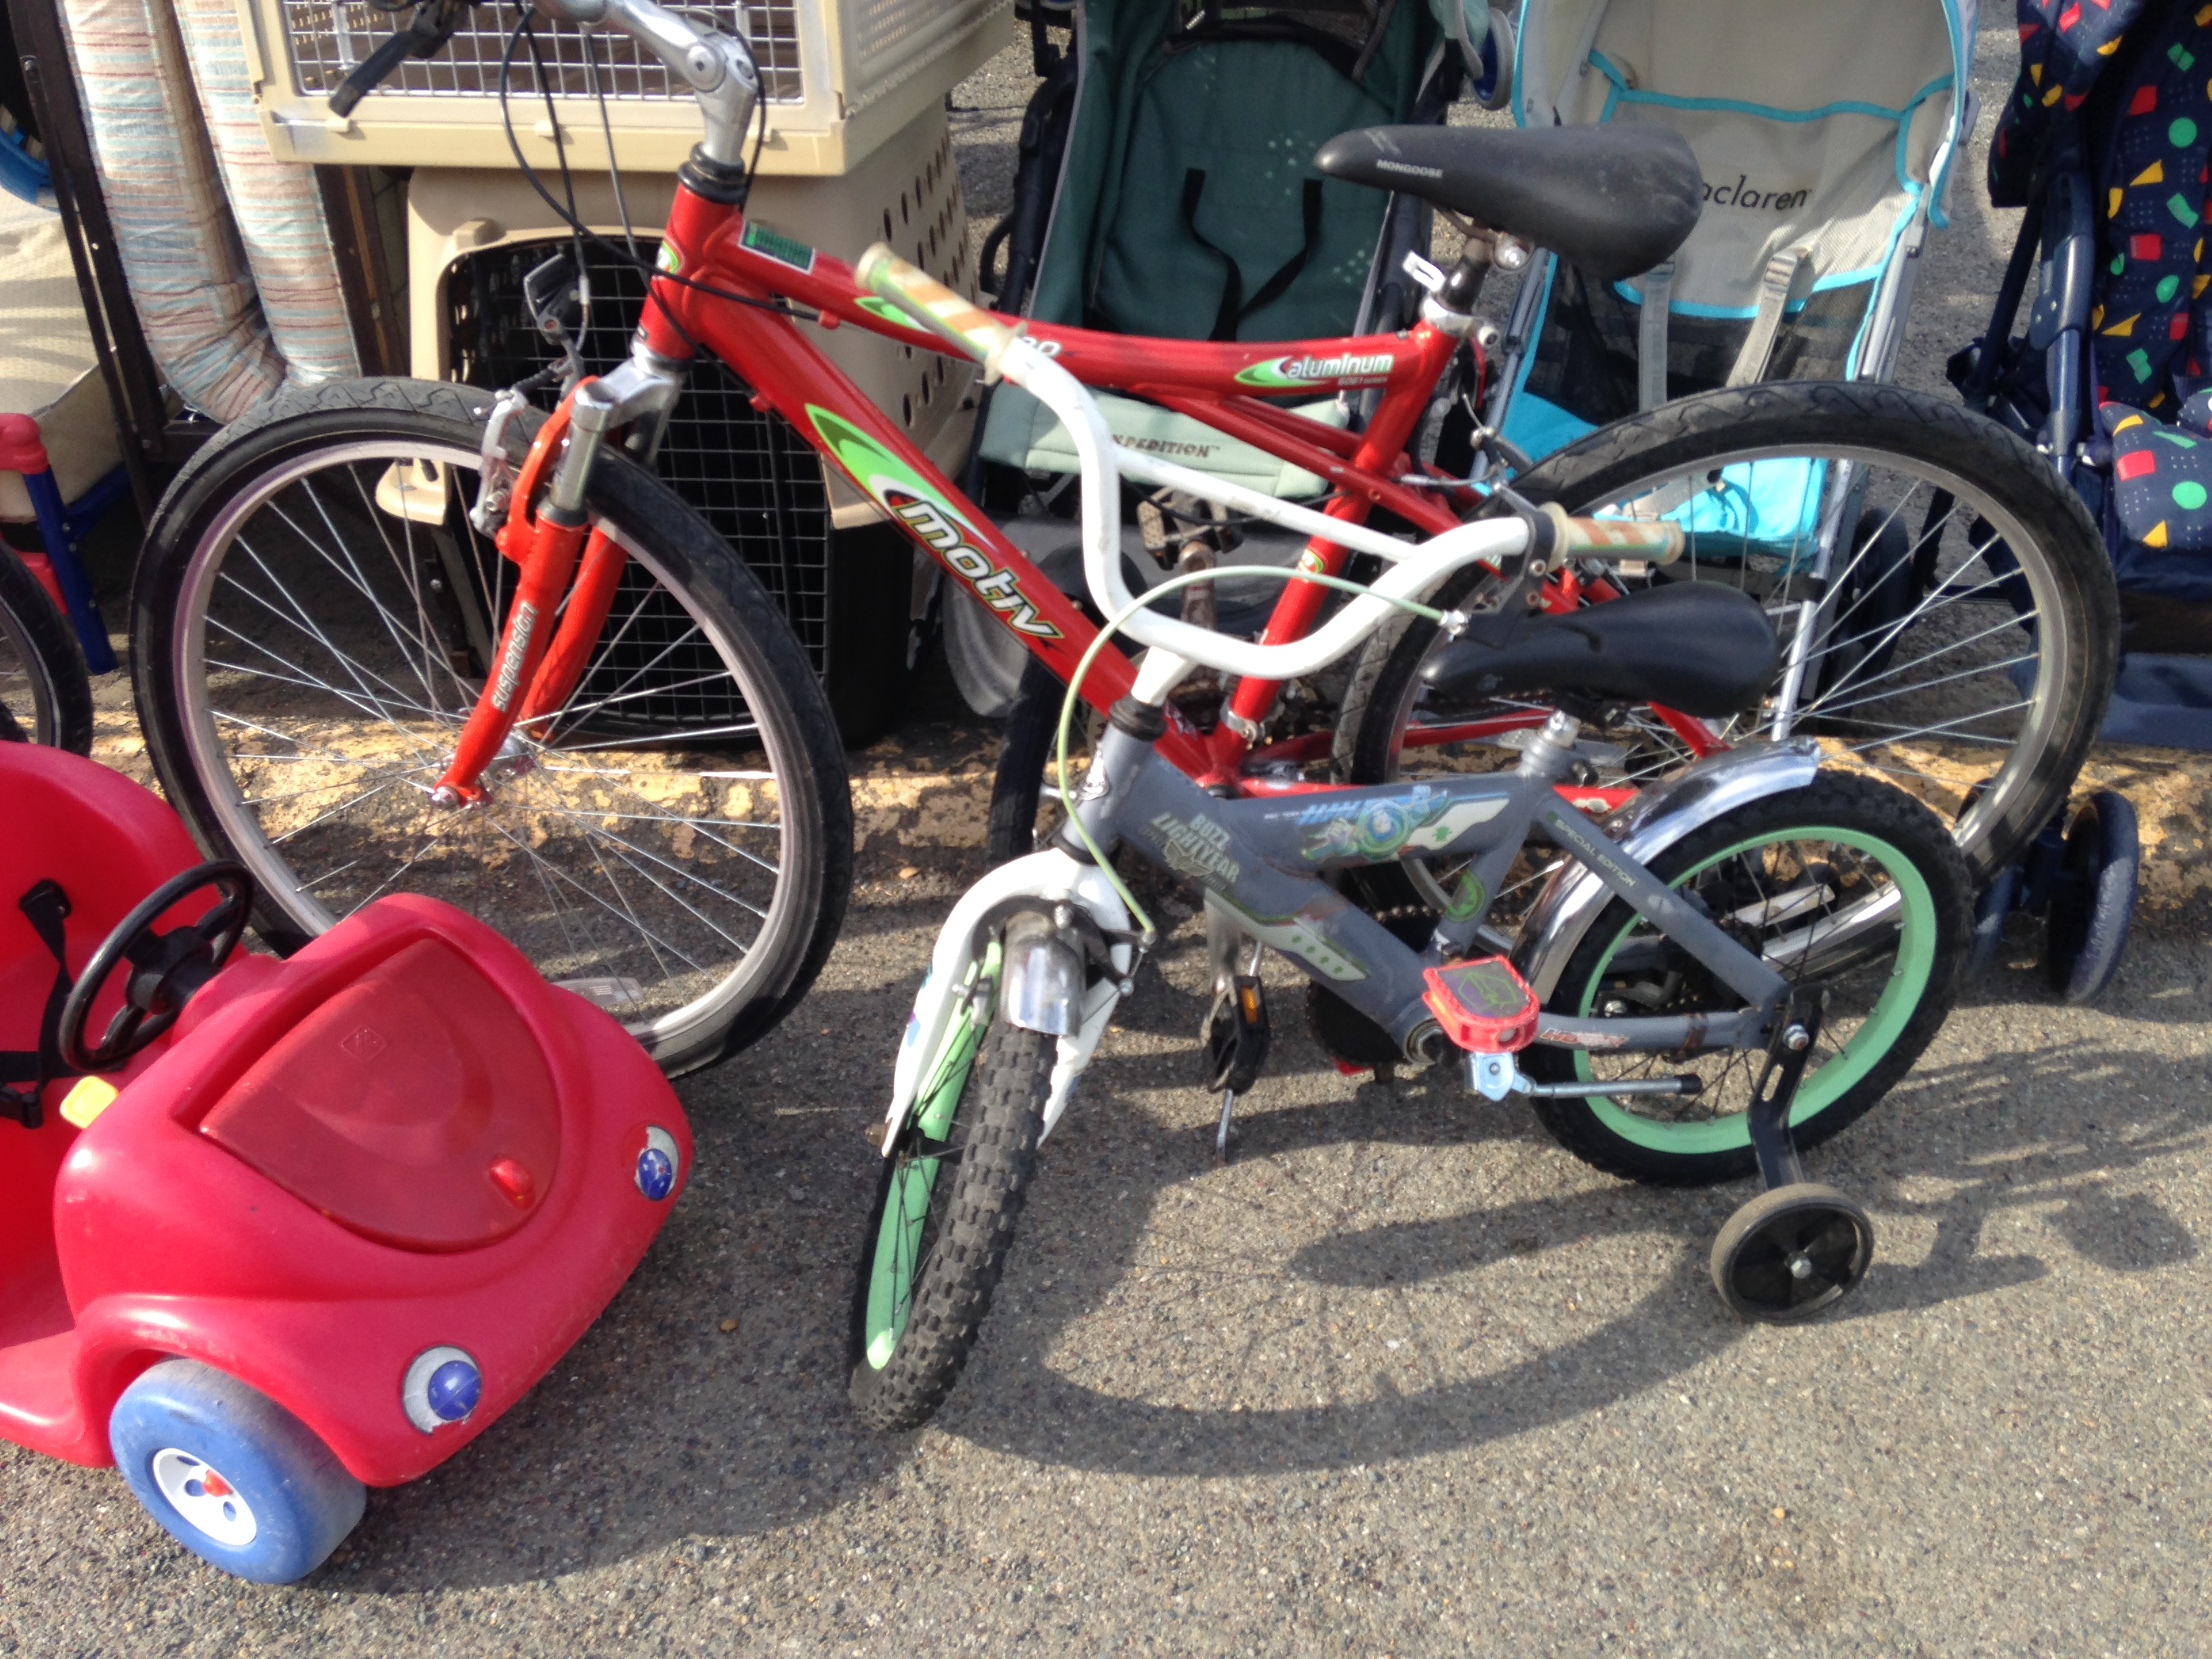 Santa Rosa, Midgley's Country Flea Market 11/21/2015 no3, Bicycles, Bike, Flea market, Outdoor, HQ Photo